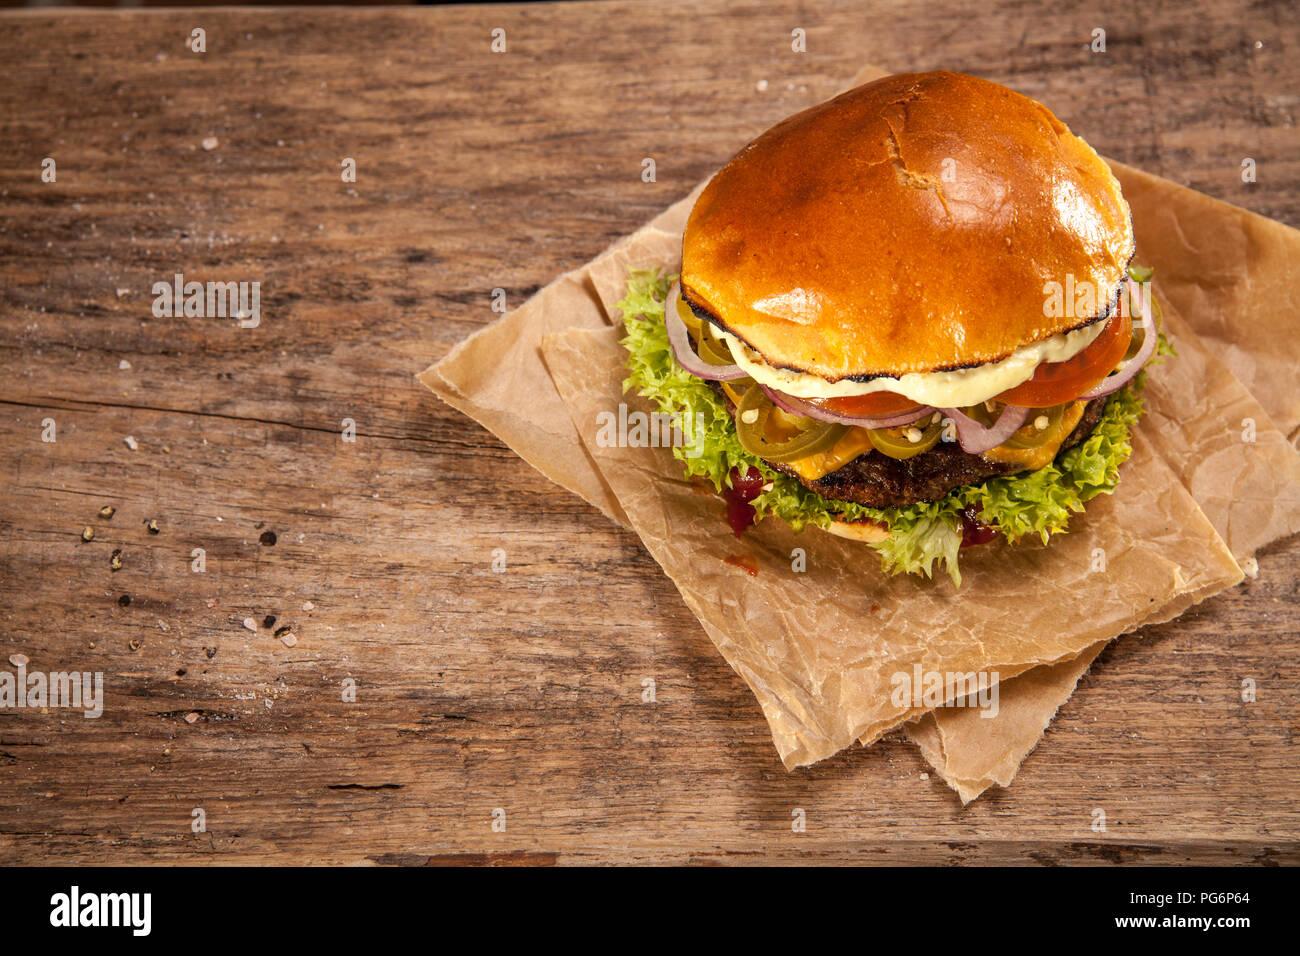 Hot Chili Burger, overhead view Photo Stock